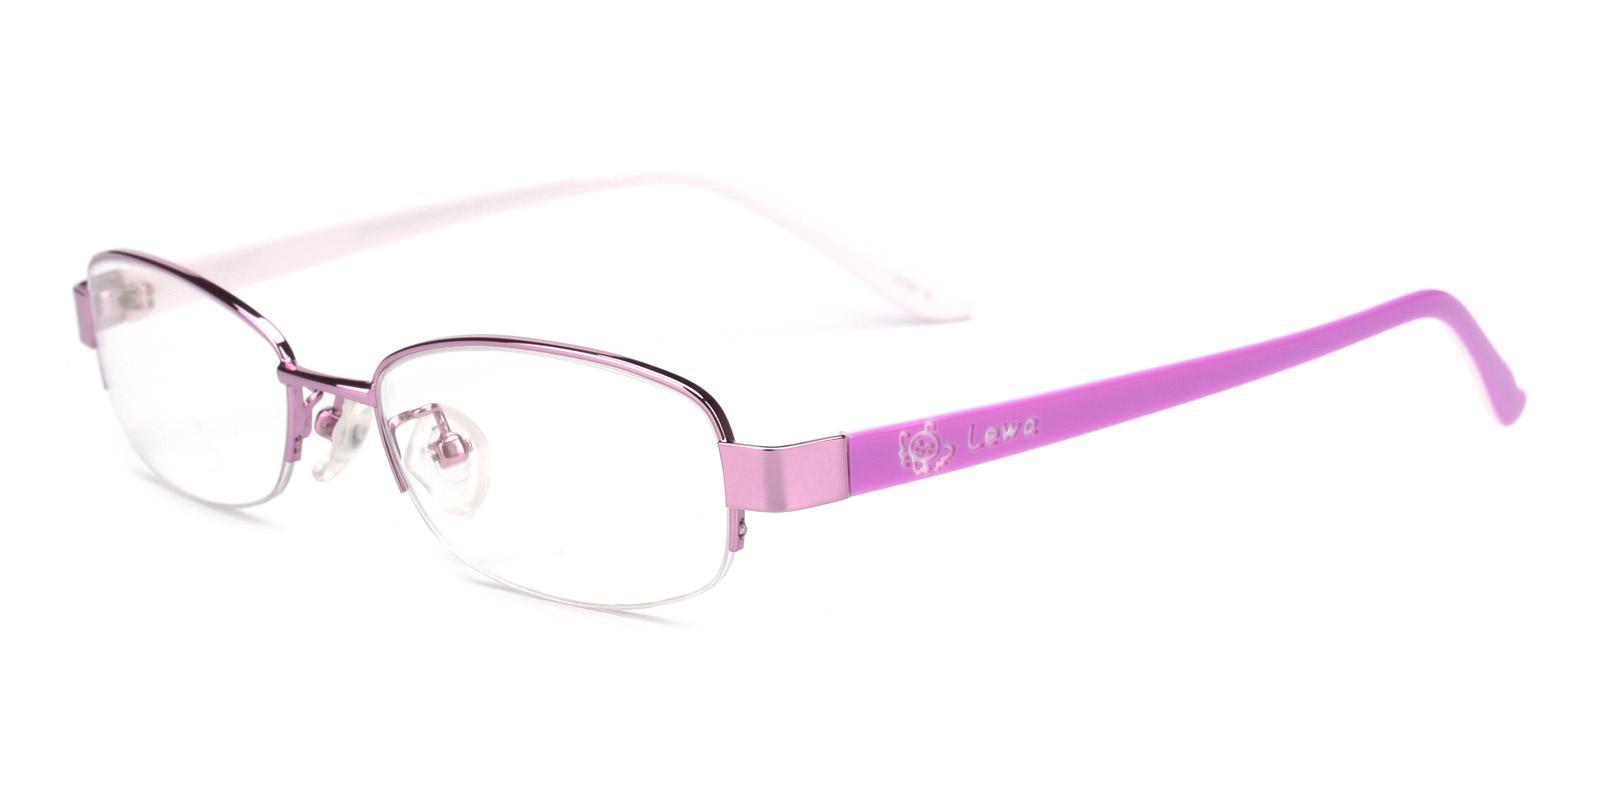 Clever-Pink-Rectangle-Metal-Eyeglasses-detail